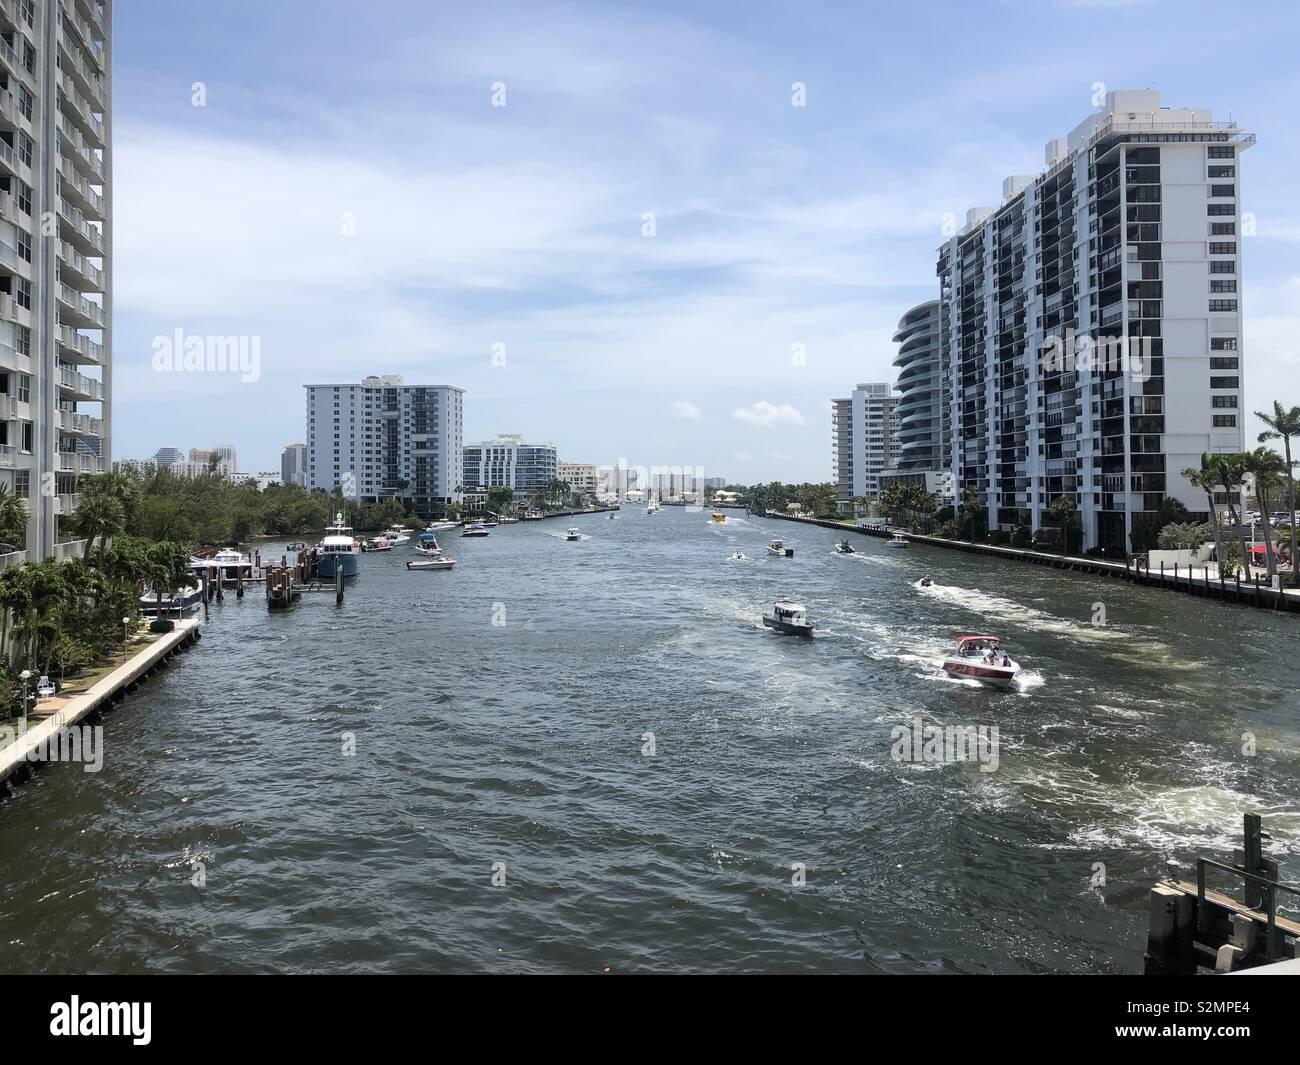 Inter coastal water way - Ft Lauderdale - Stock Image